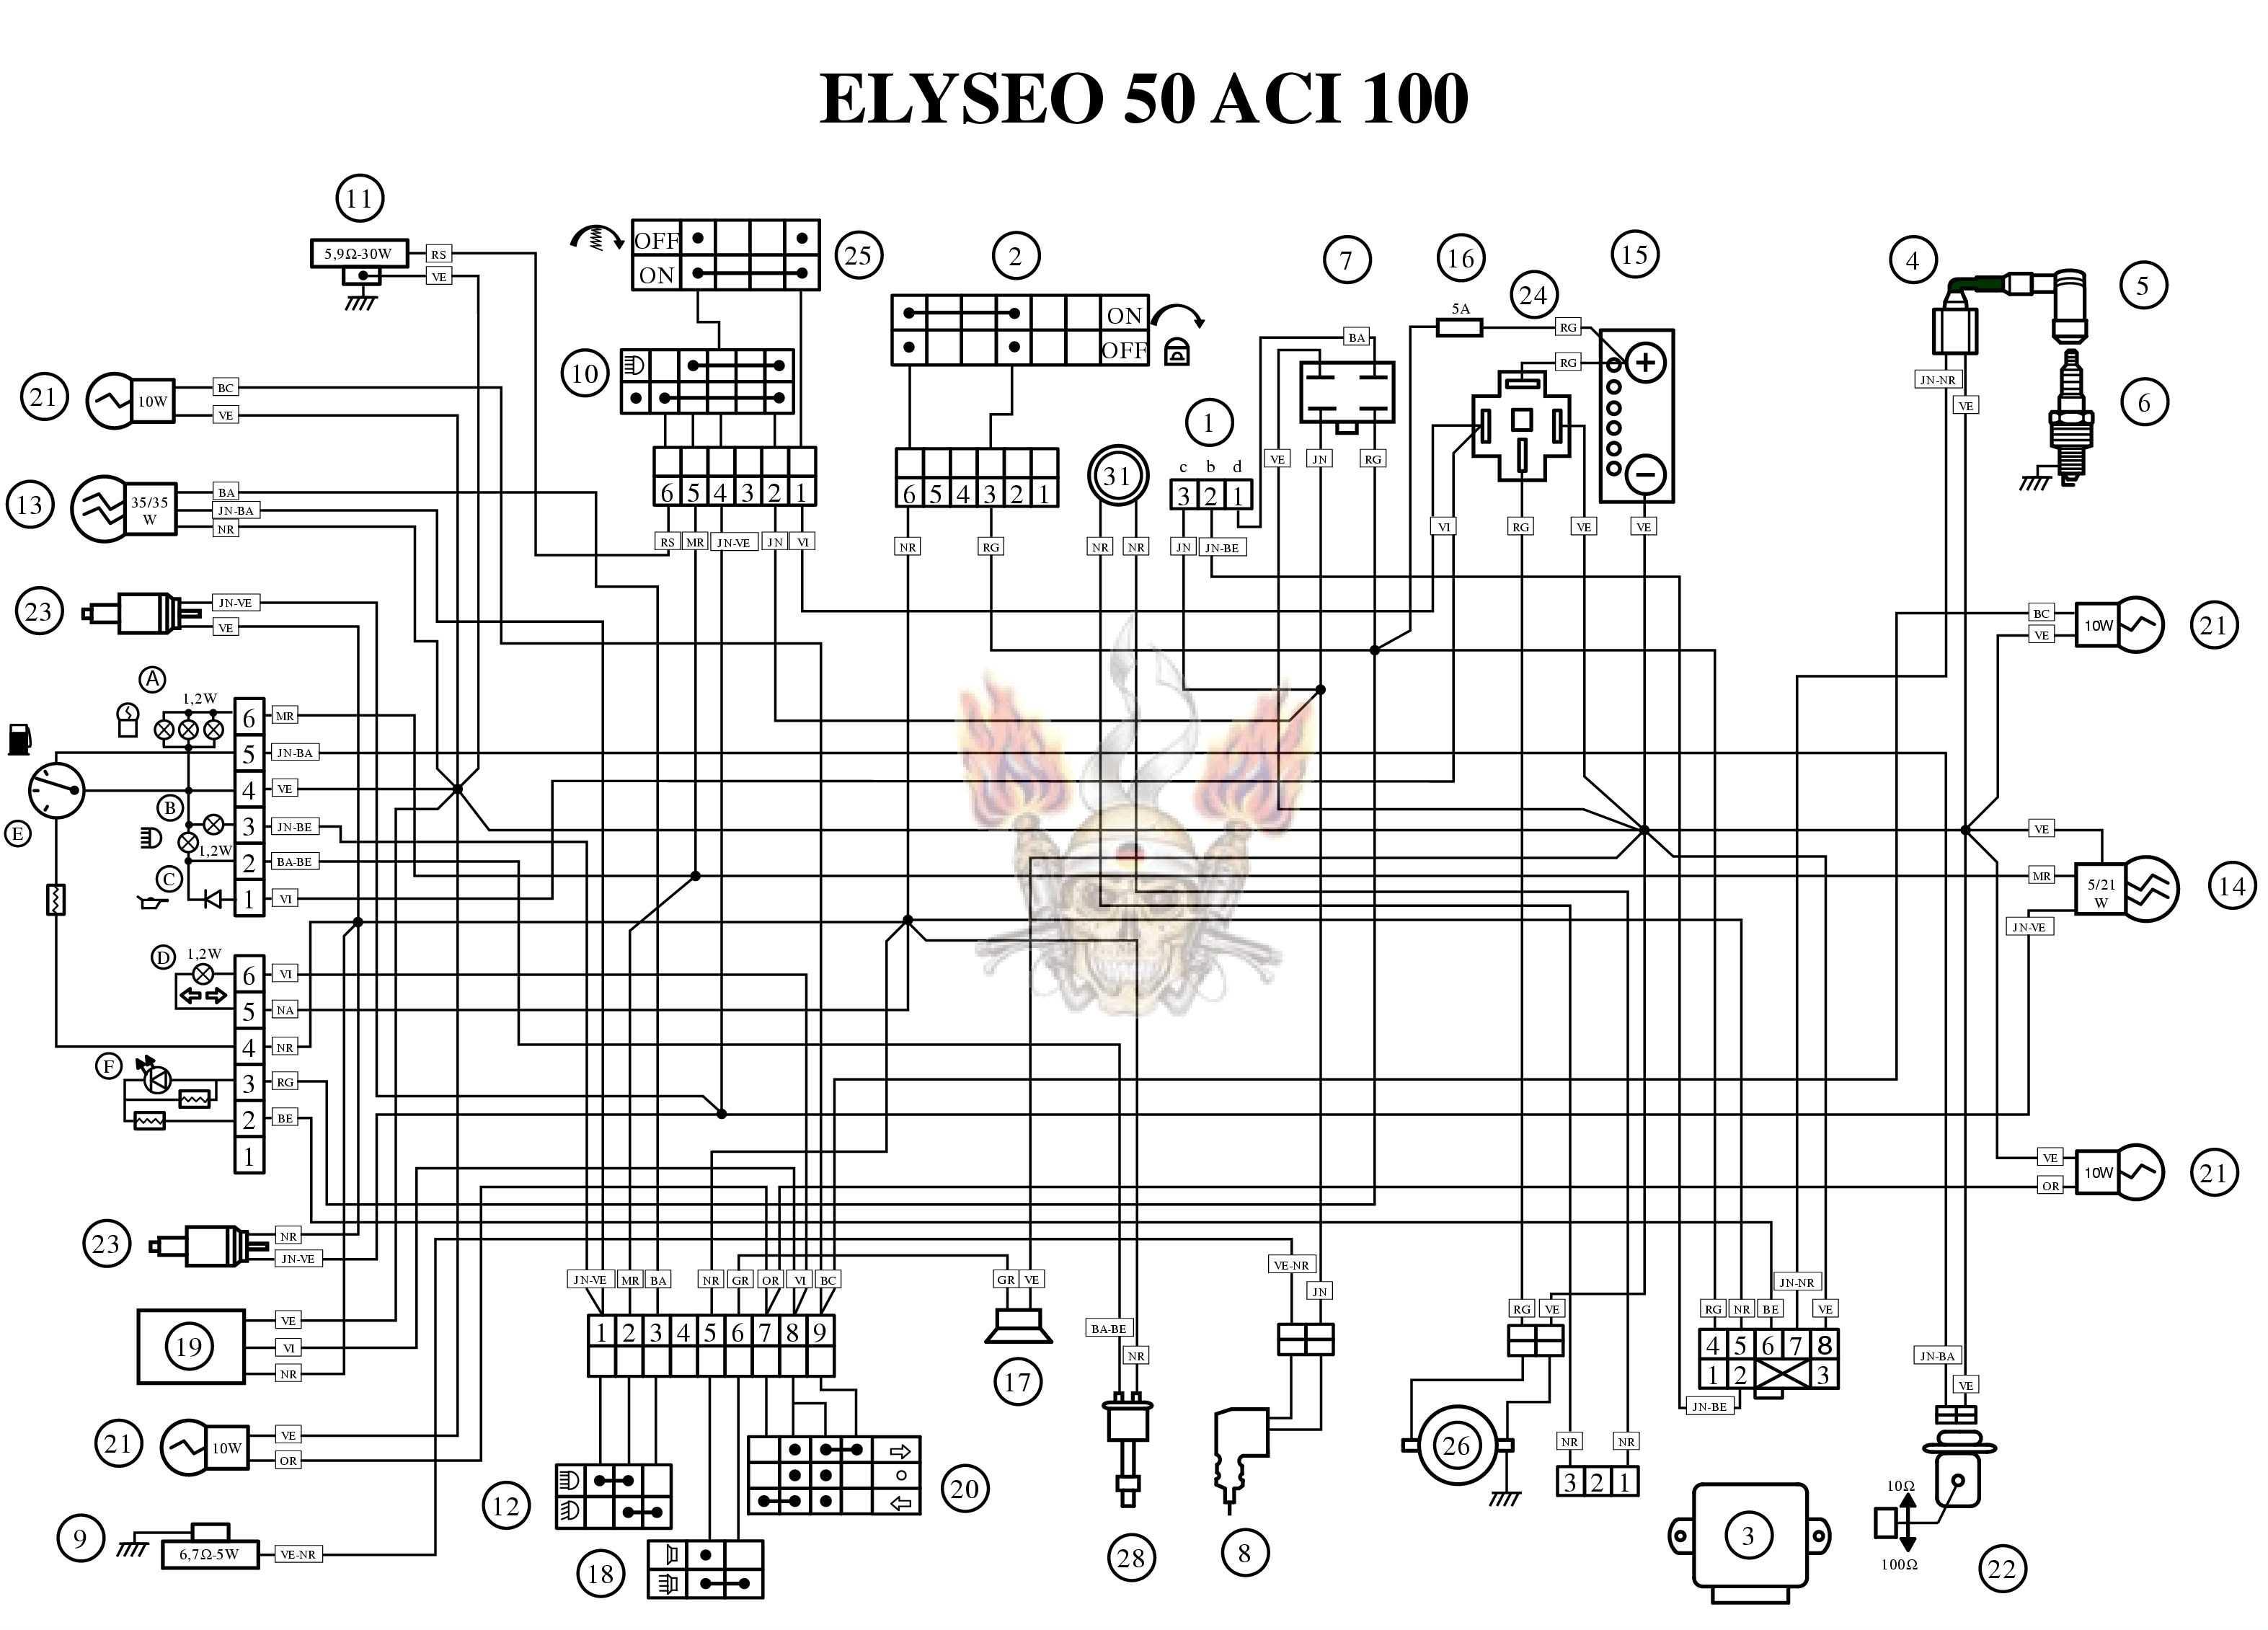 hight resolution of peugeot 807 wiring diagram free download peugeot 807 wiring diagram download efcaviation com